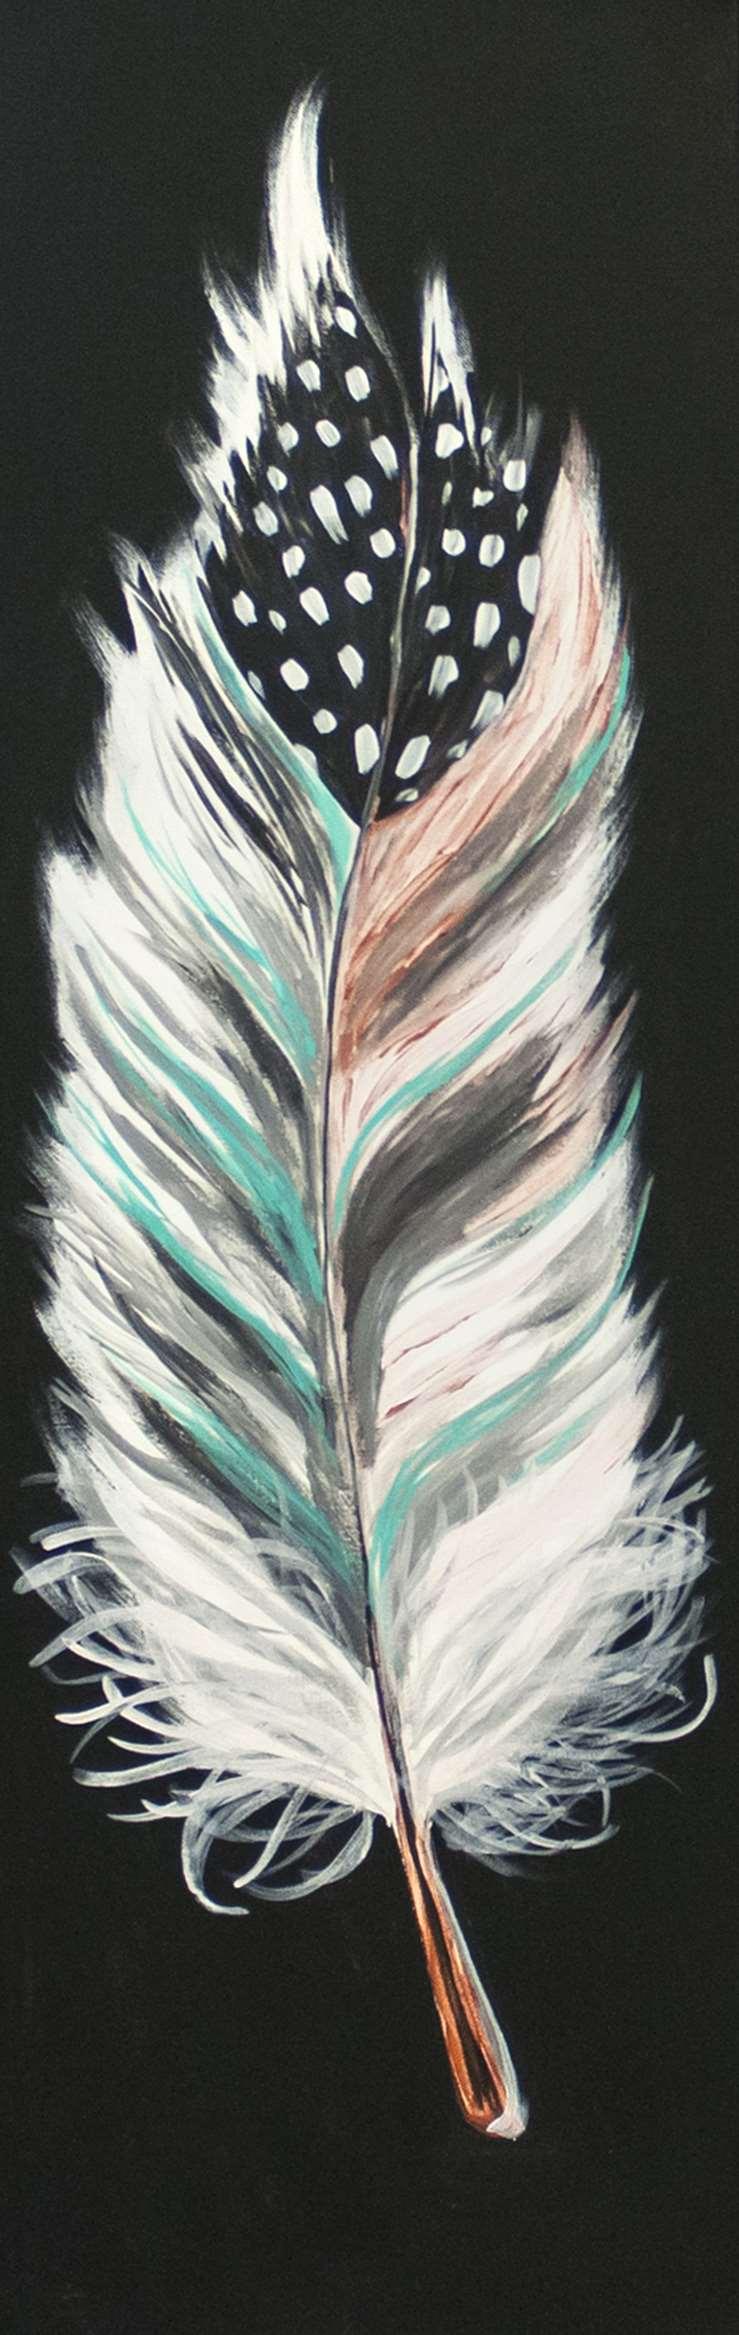 Fallen Feather